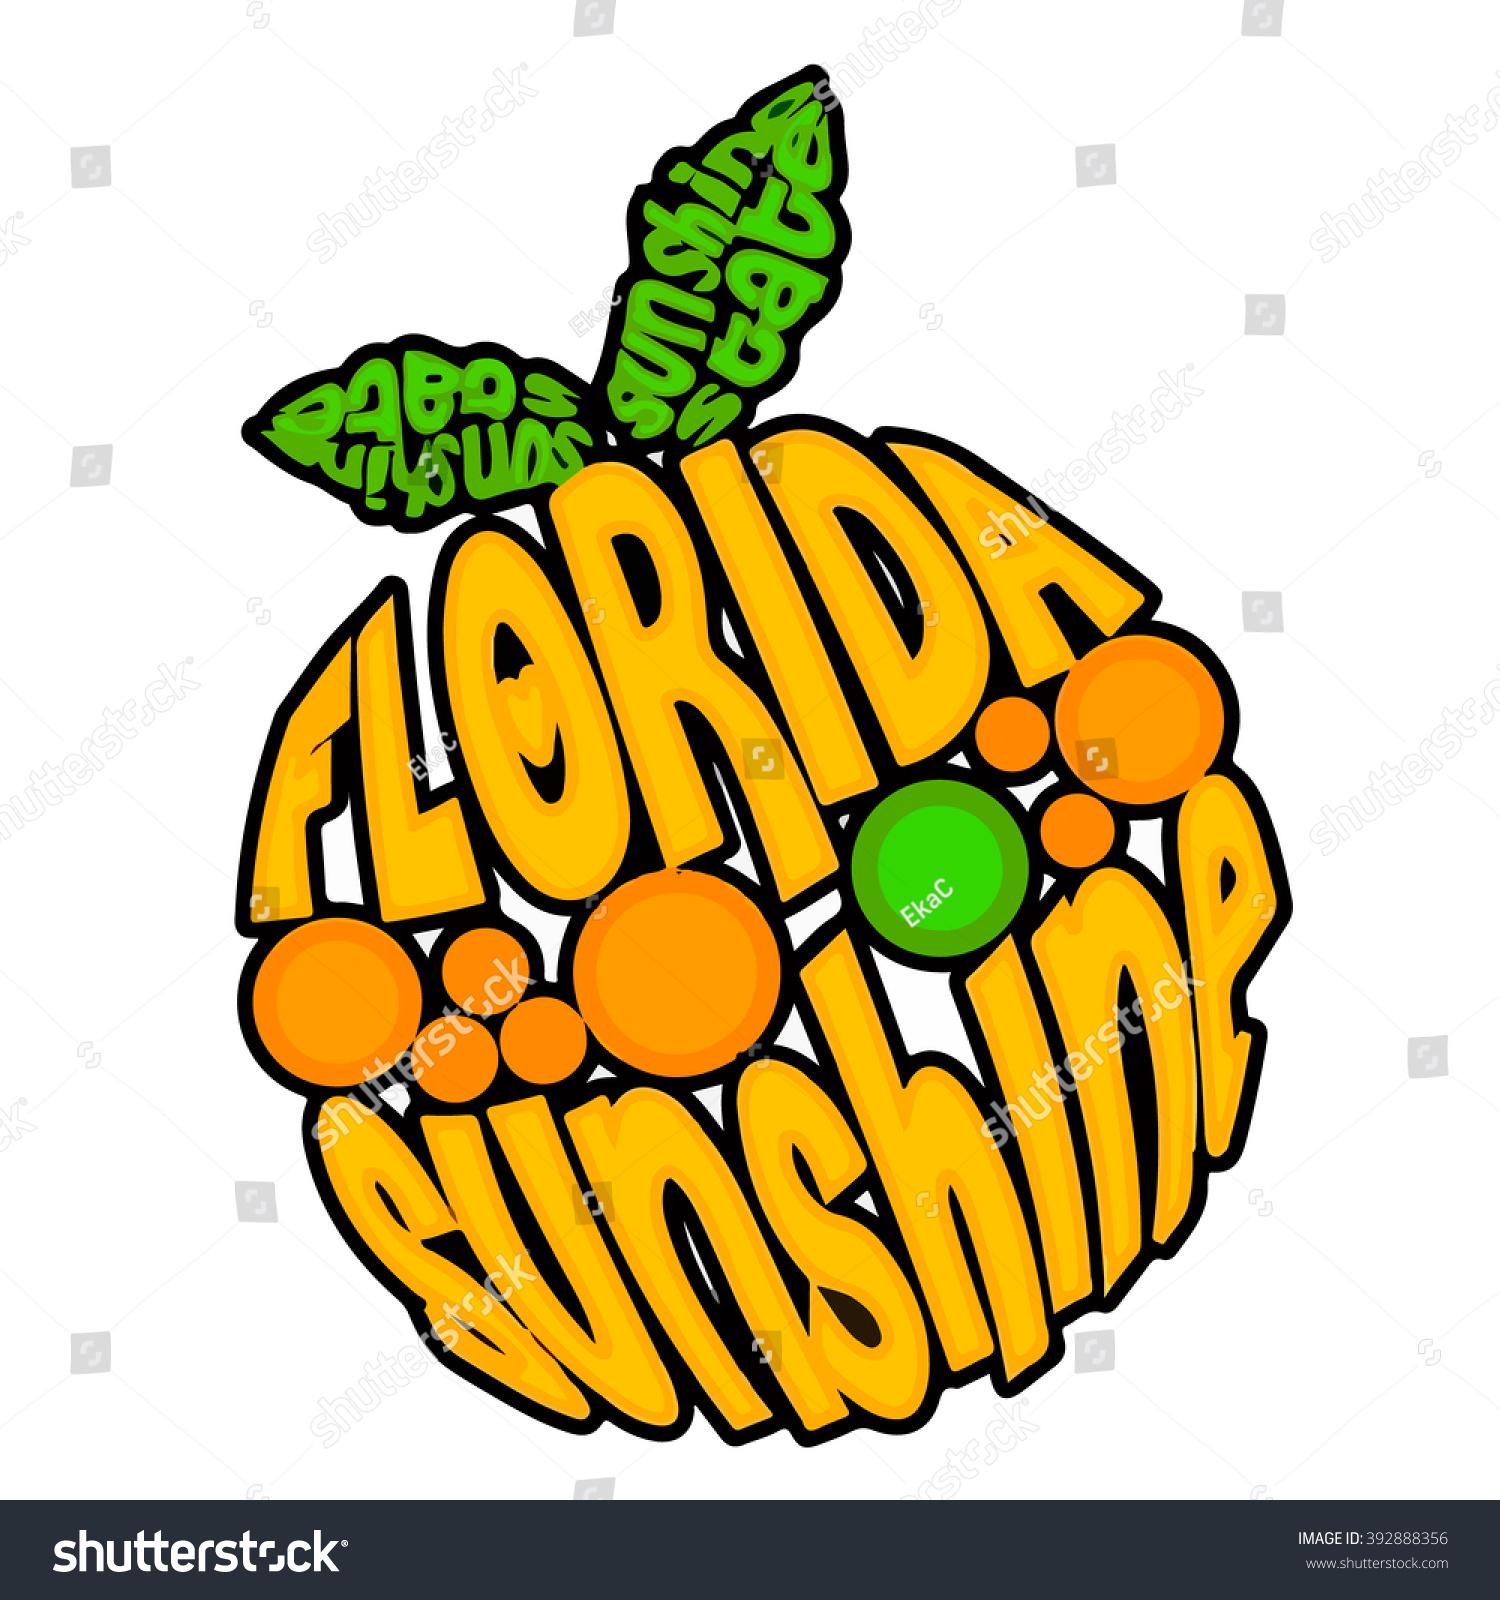 Florida sunshine state orange symbol fl stock vector 392888356 florida the sunshine state orange symbol of fl usa with letters in abstract symbol of buycottarizona